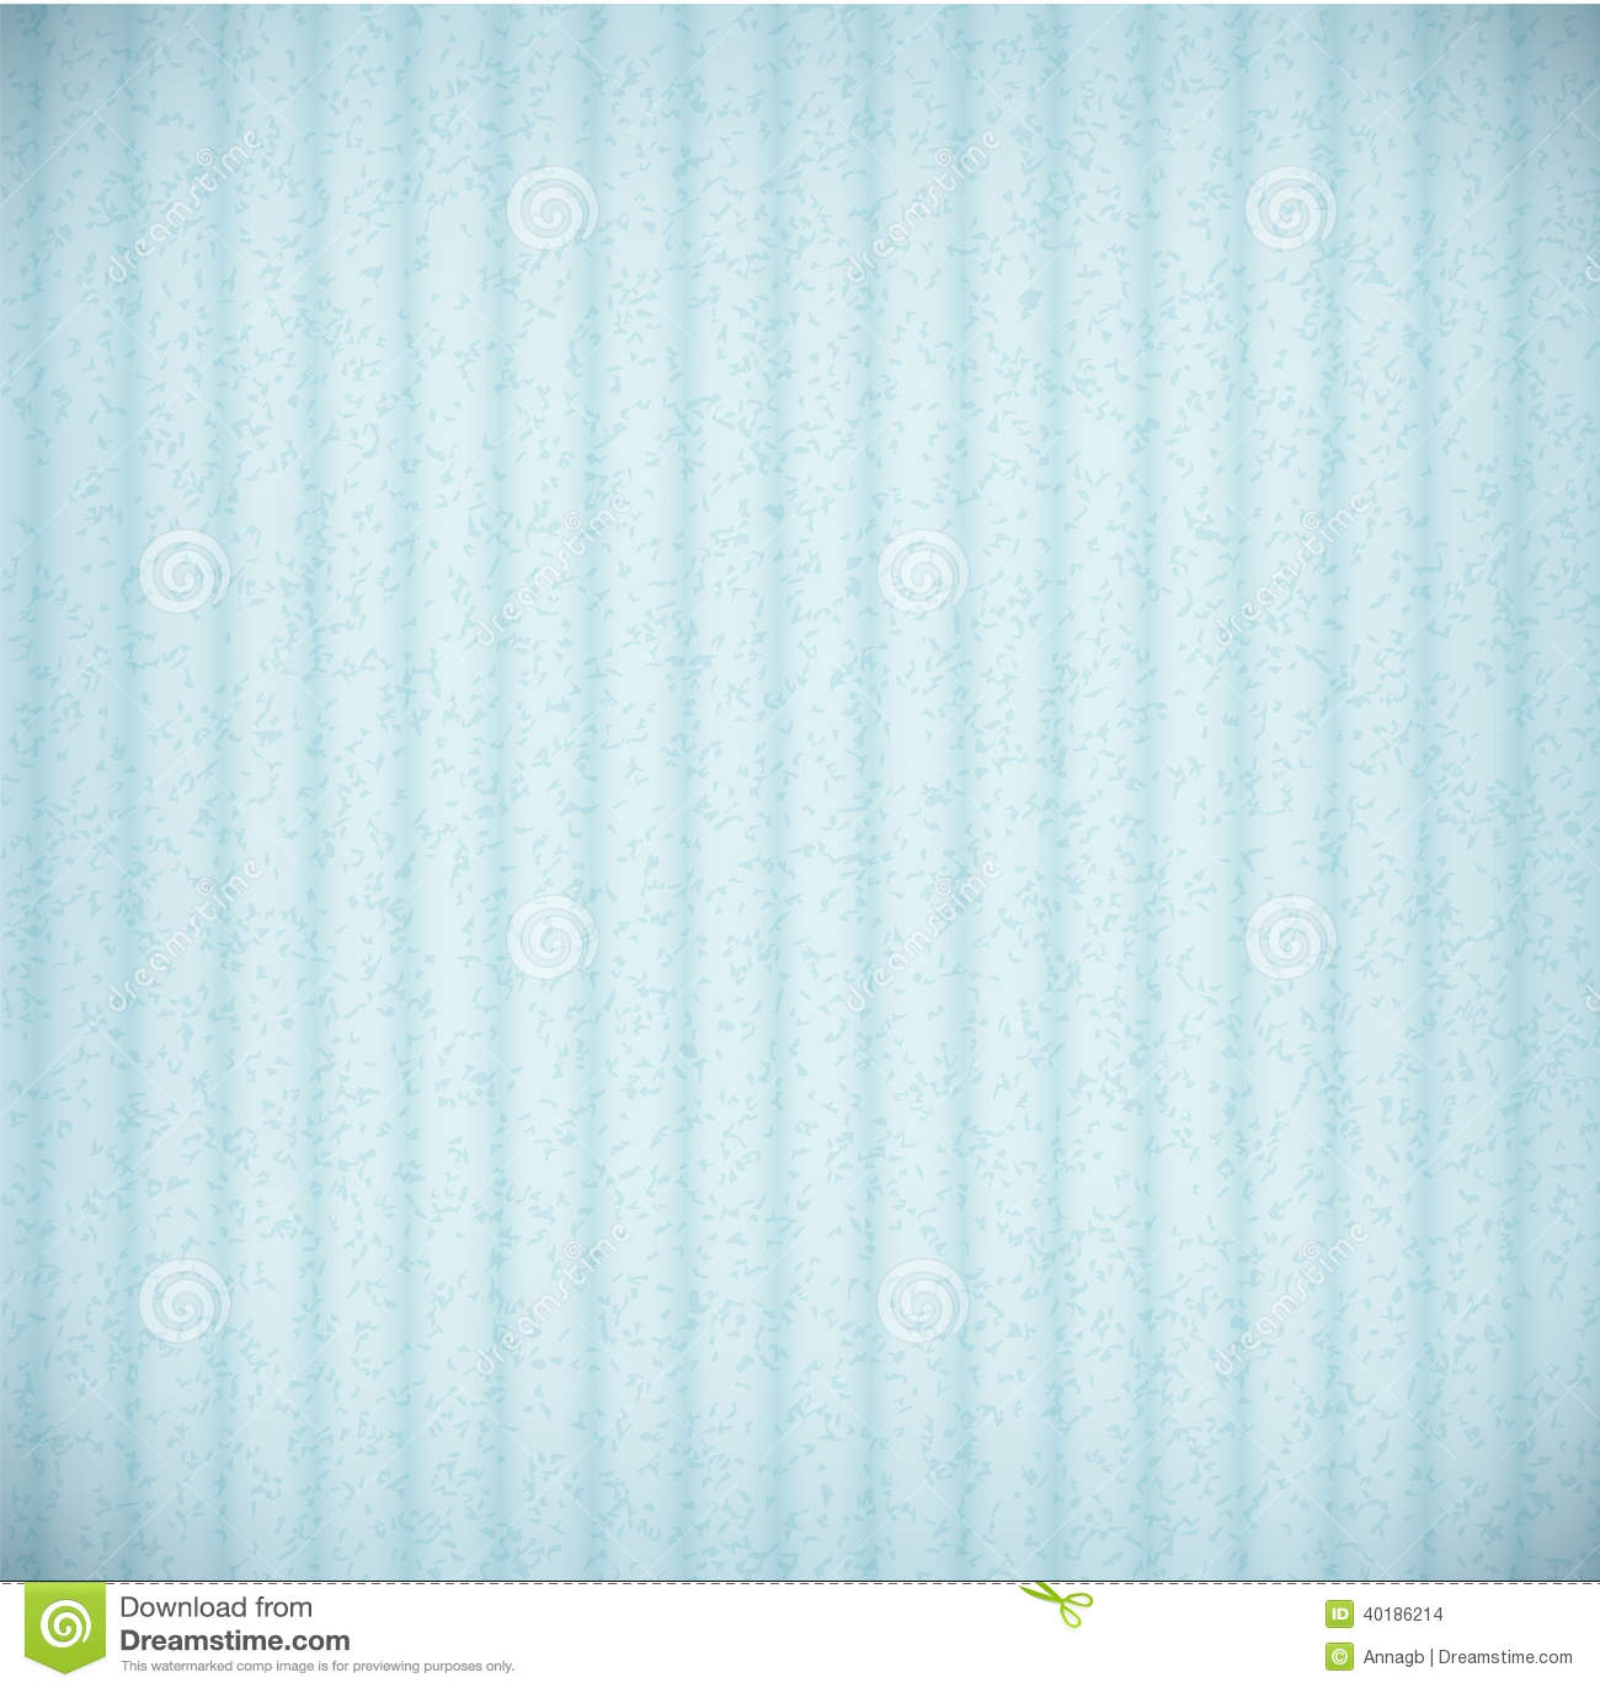 Abstract patroon vector wit blauw als achtergrond